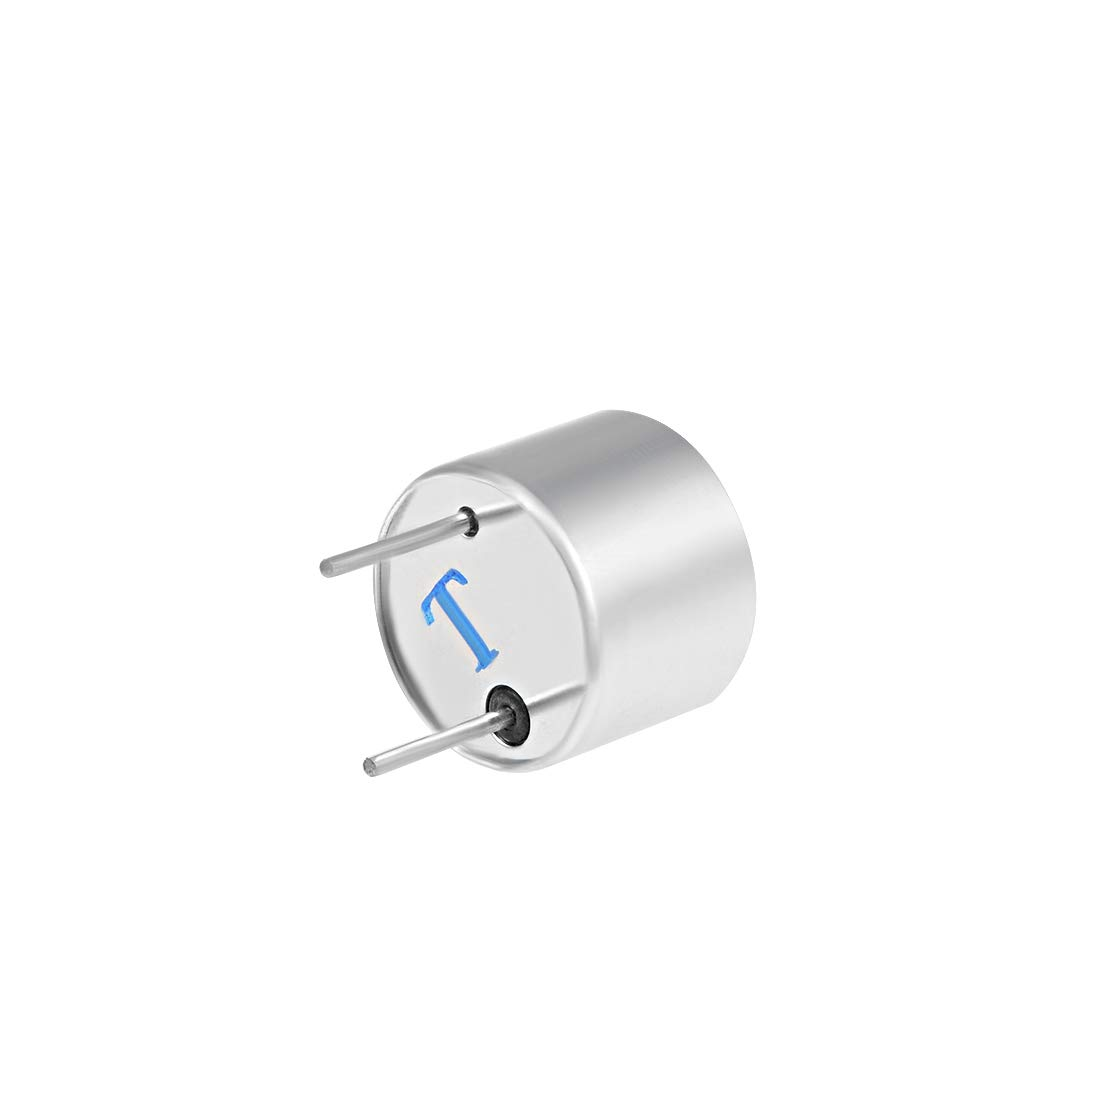 uxcell TCT40-16T Ultrasonic Transducer Transmitter Probe